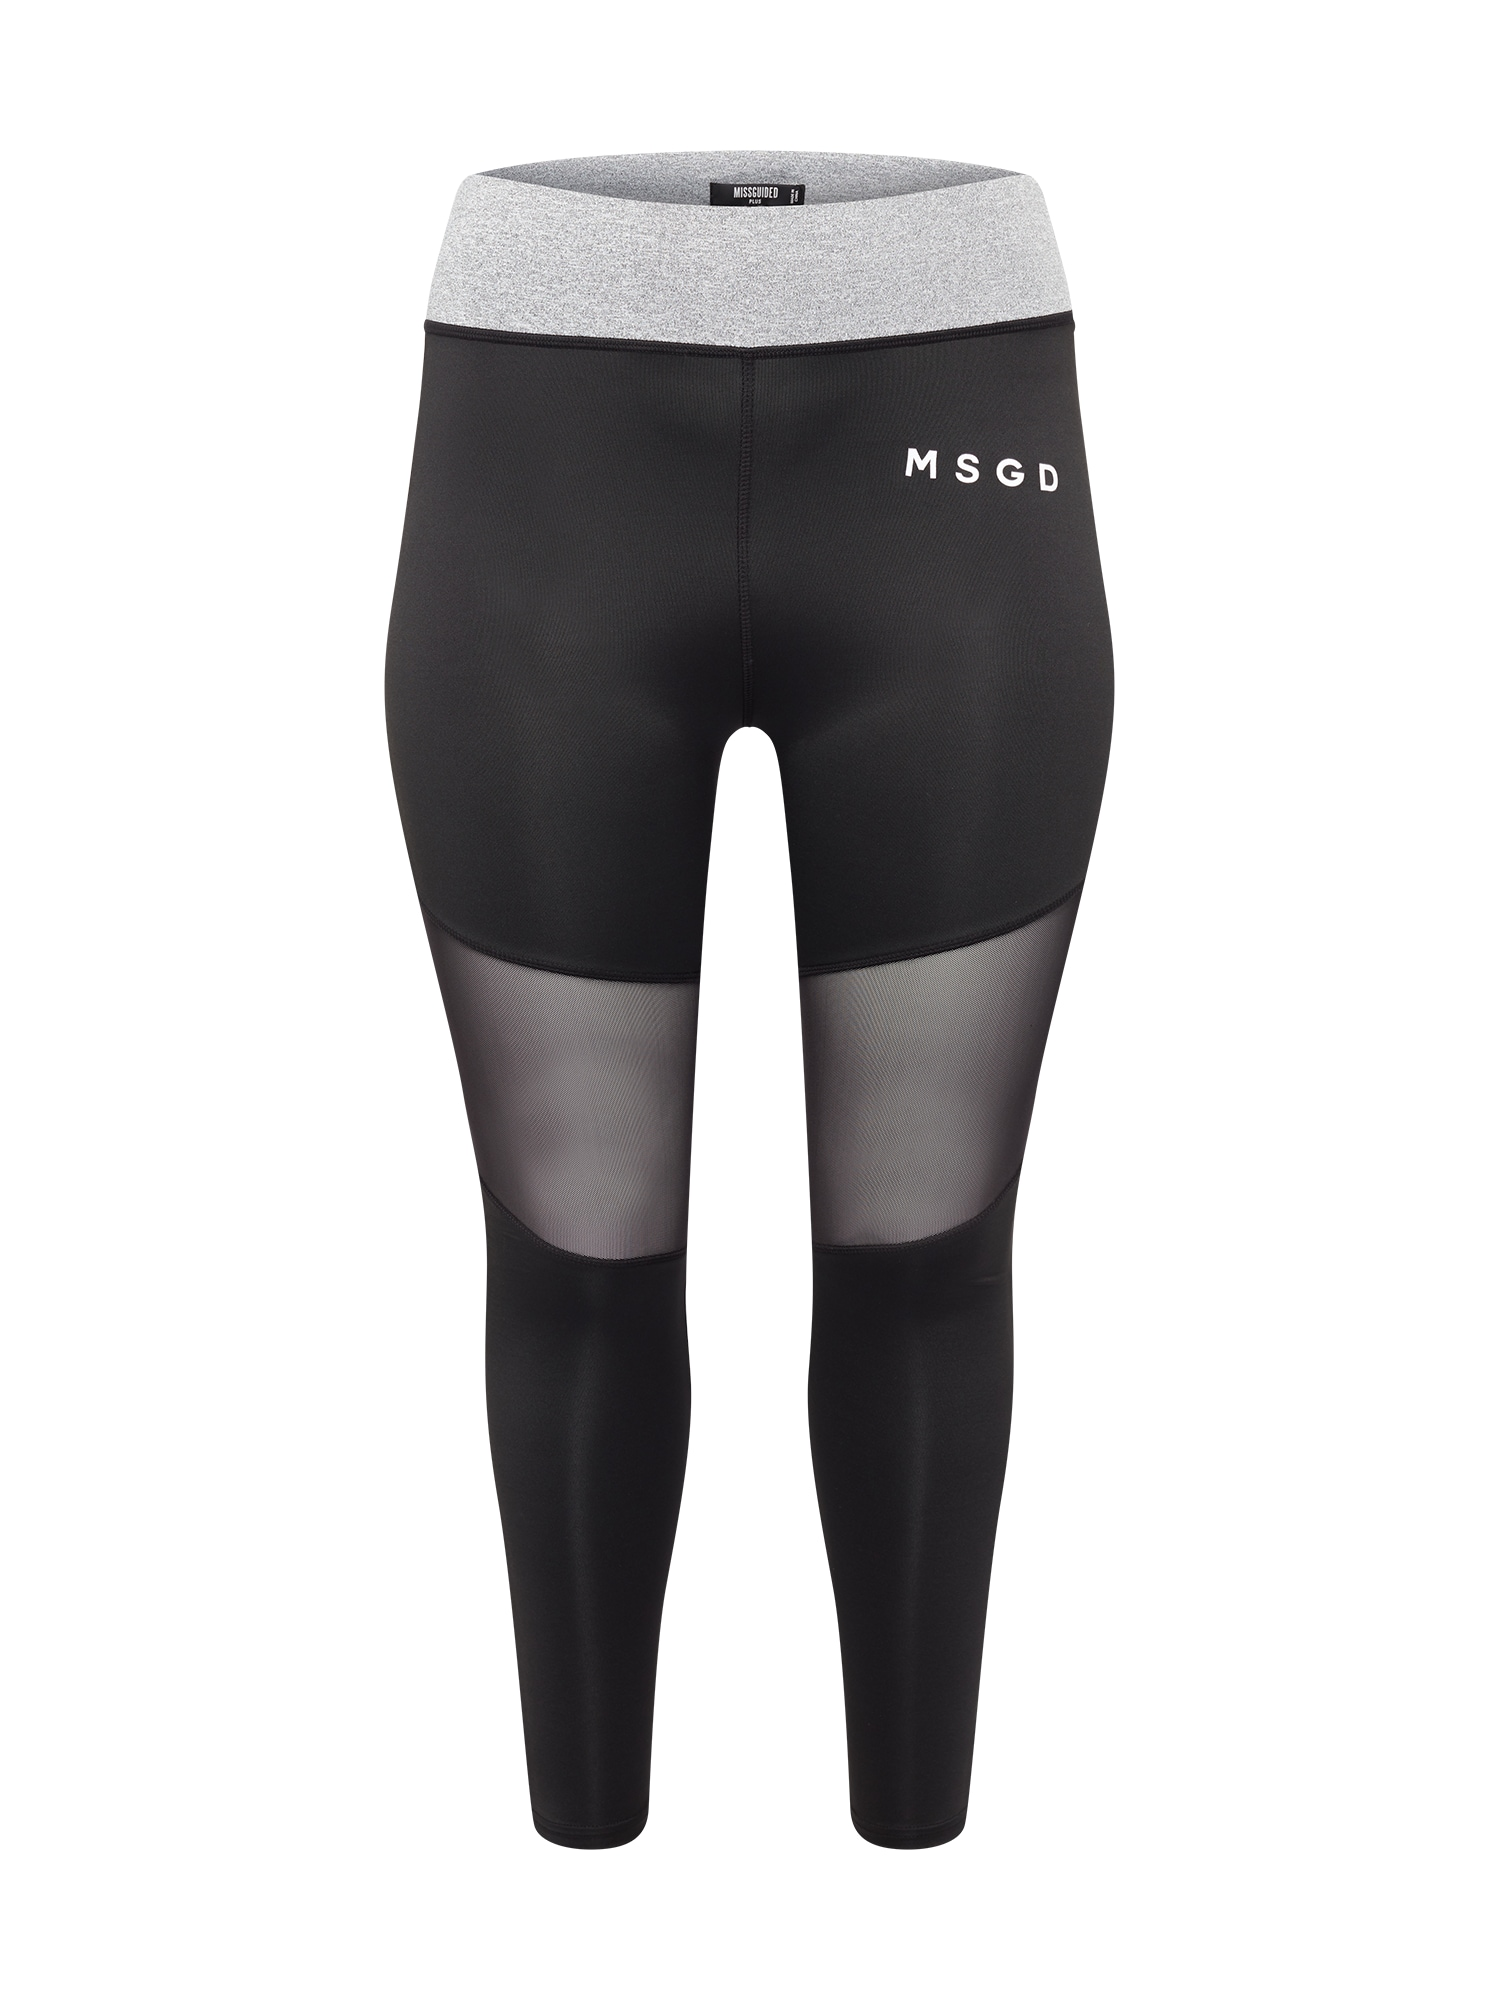 Missguided Plus Tamprės juoda / balta / margai pilka